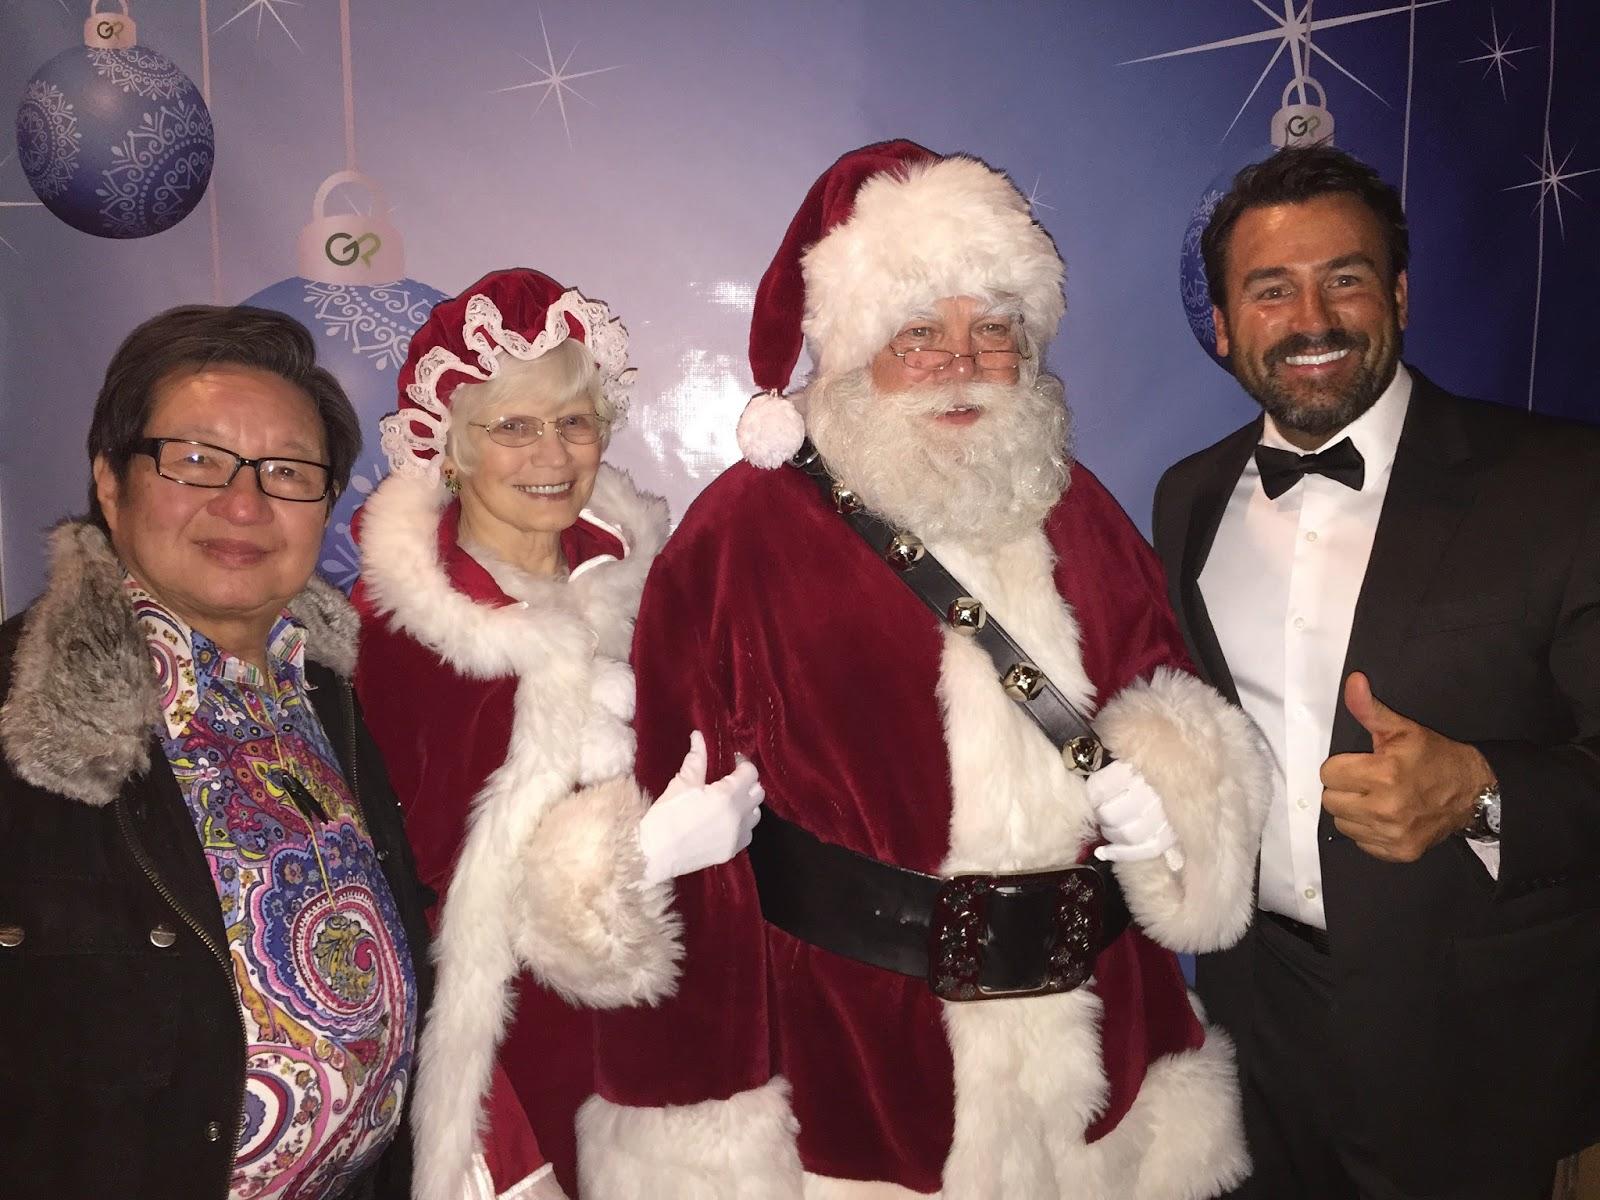 Santa Claus and GotPrint crew posing for camera